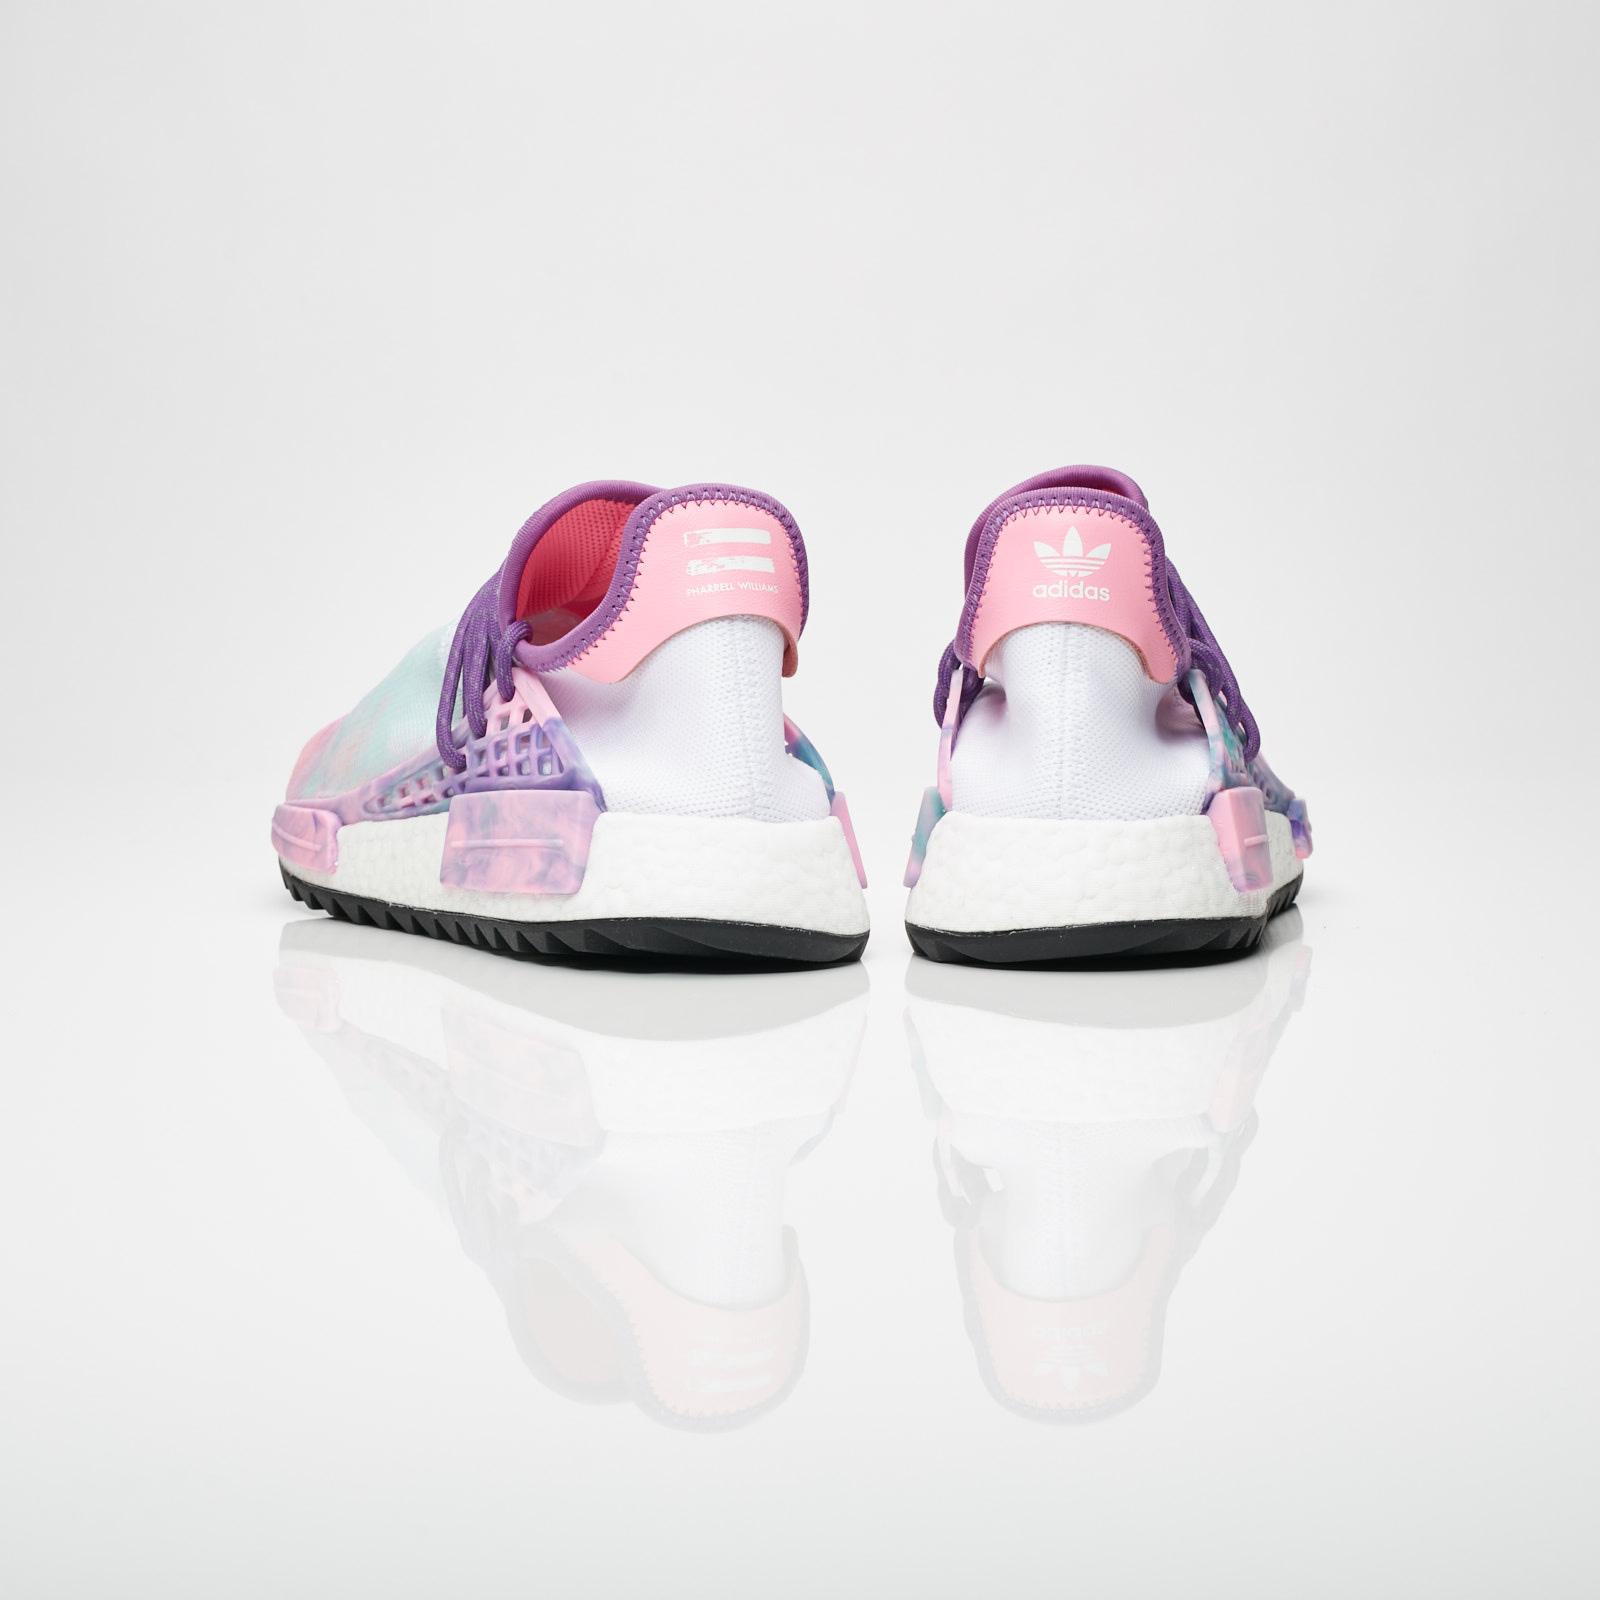 60287a0e8 adidas Pharrell Williams HU Holi NMD MC - Ac7362 - Sneakersnstuff    sneakers & streetwear online since 1999